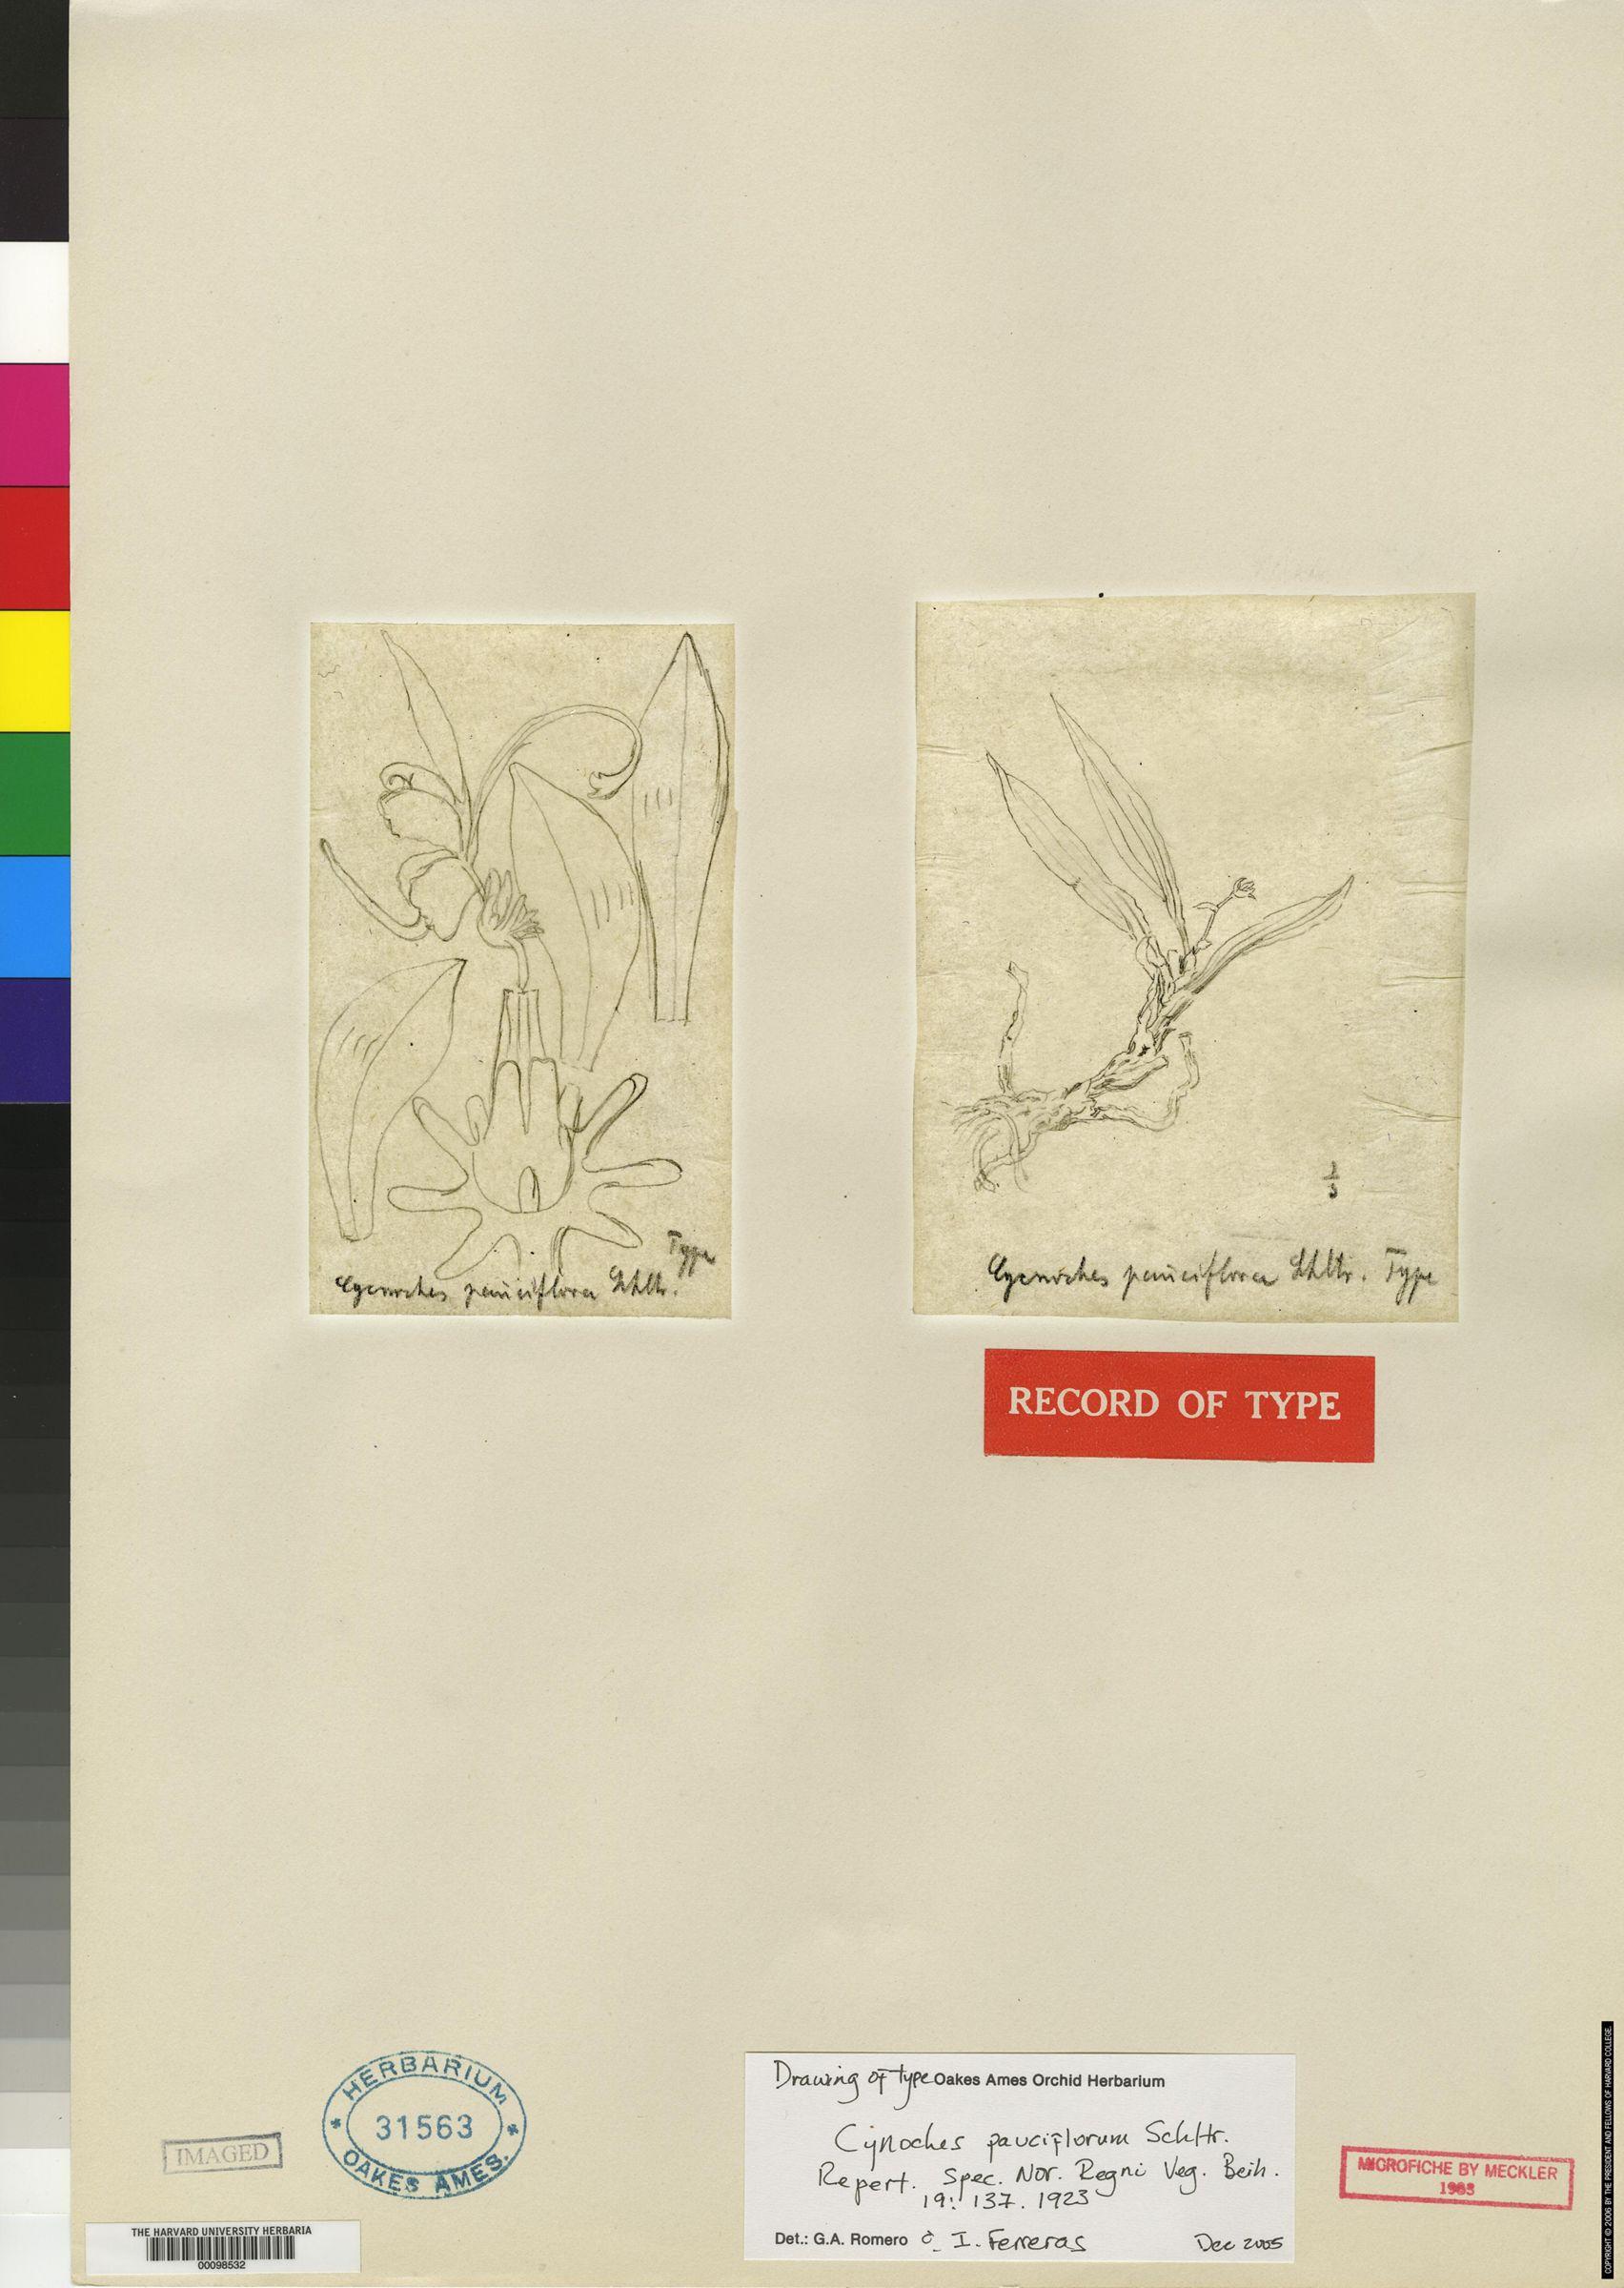 Cycnoches egertonianum image